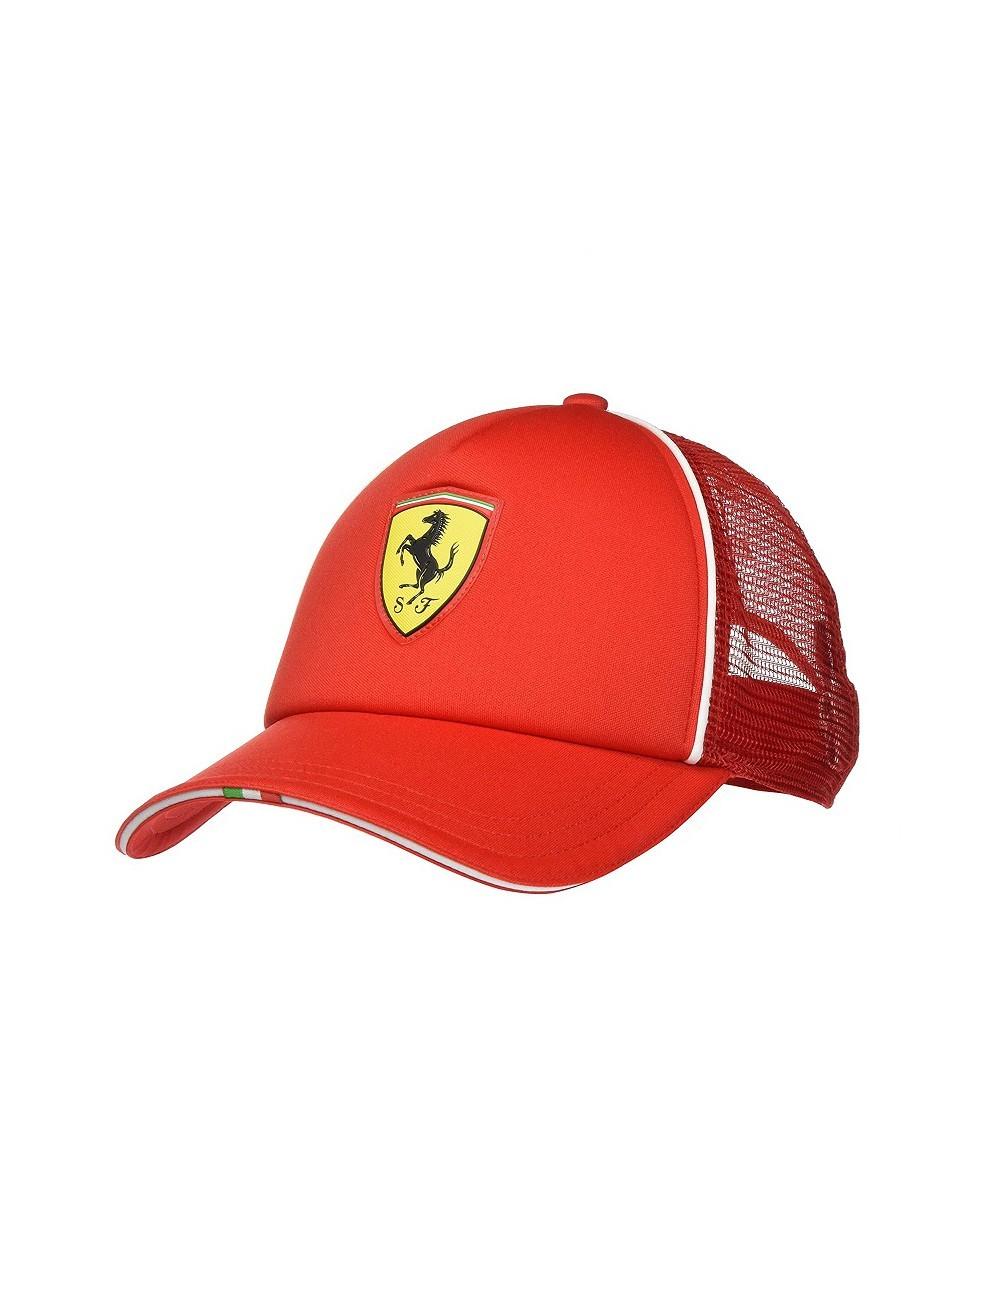 Boné Ferrari FanWear Trucker Puma - Unissex